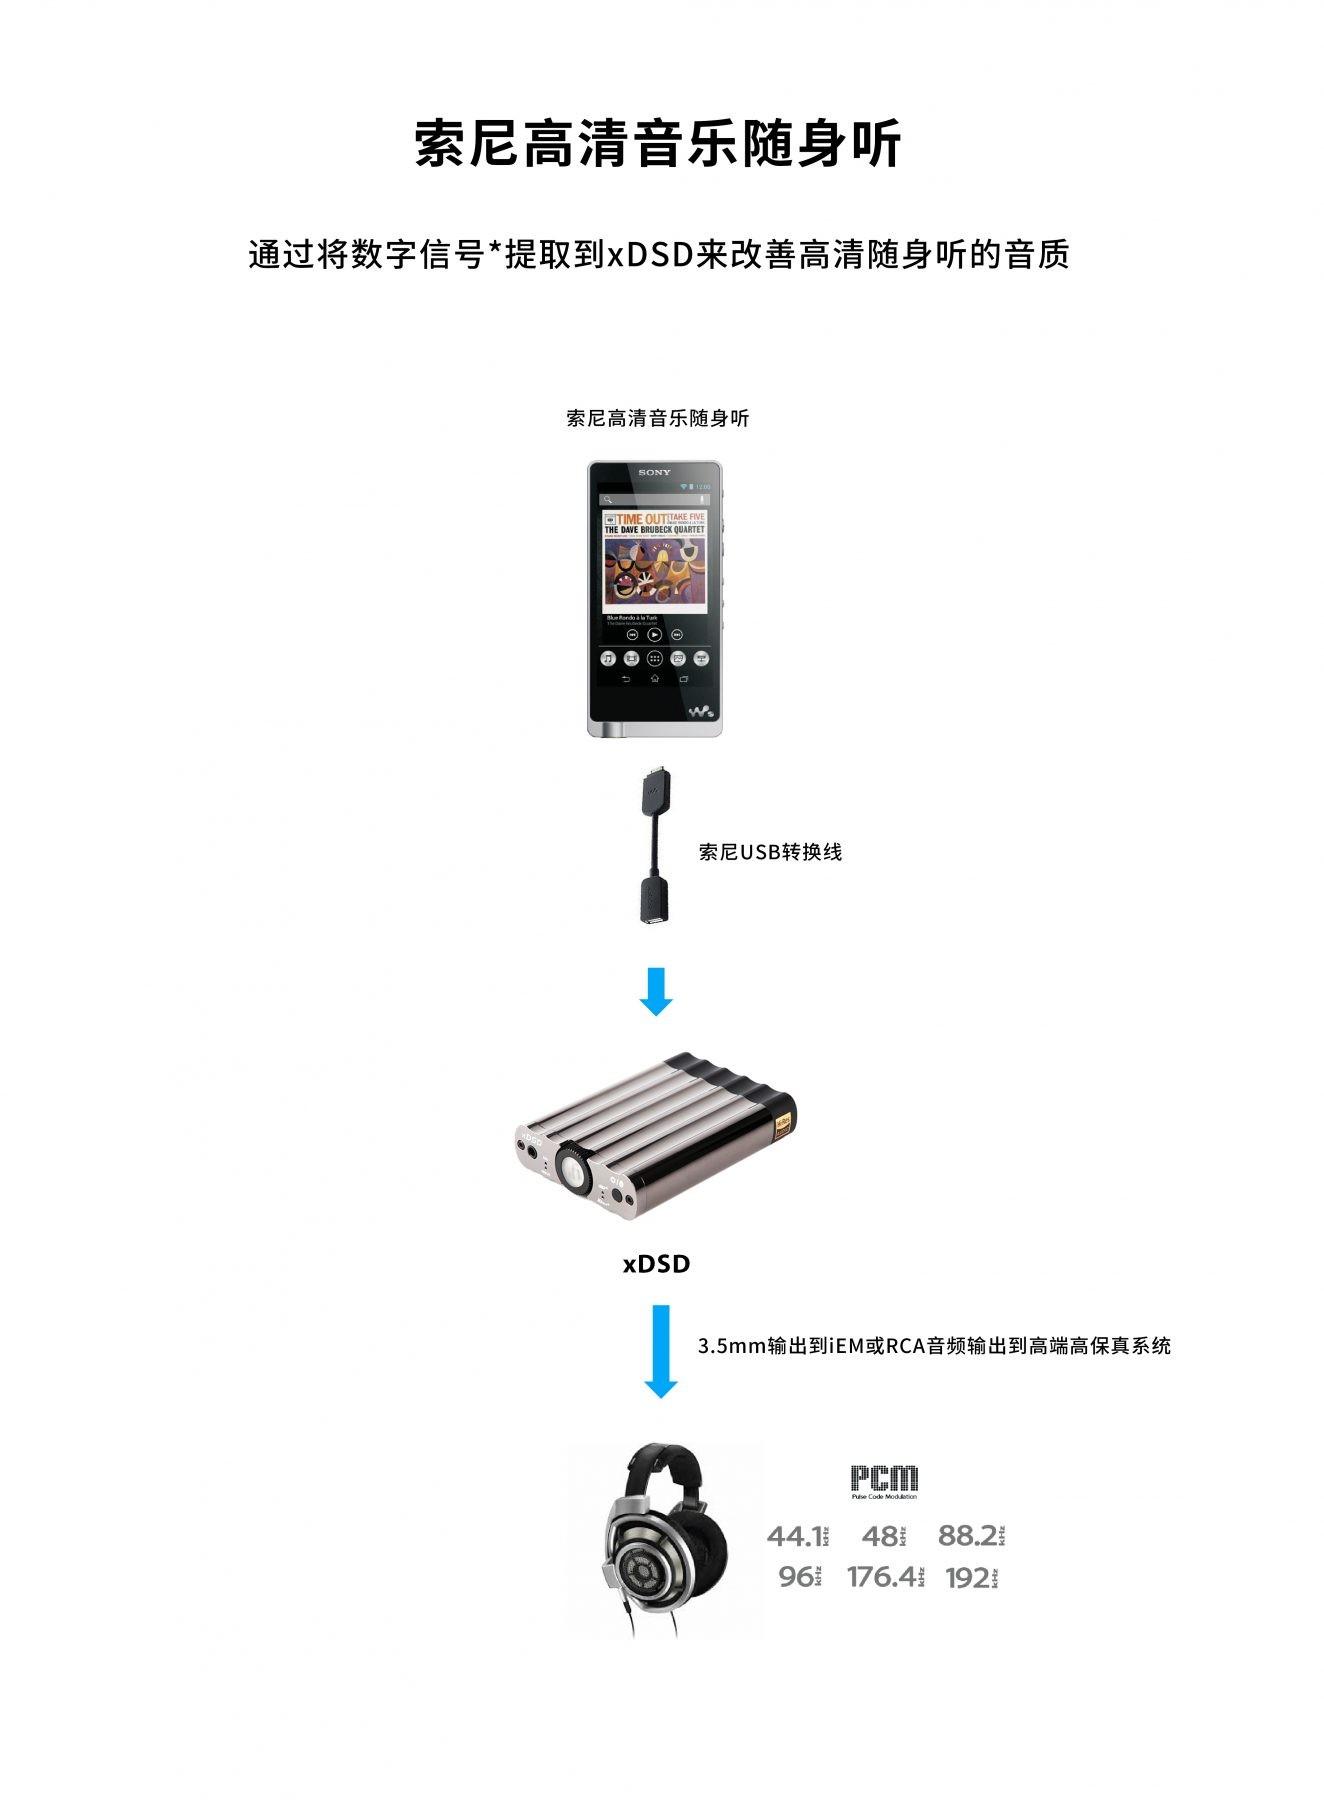 Sony Hi-res Walkman